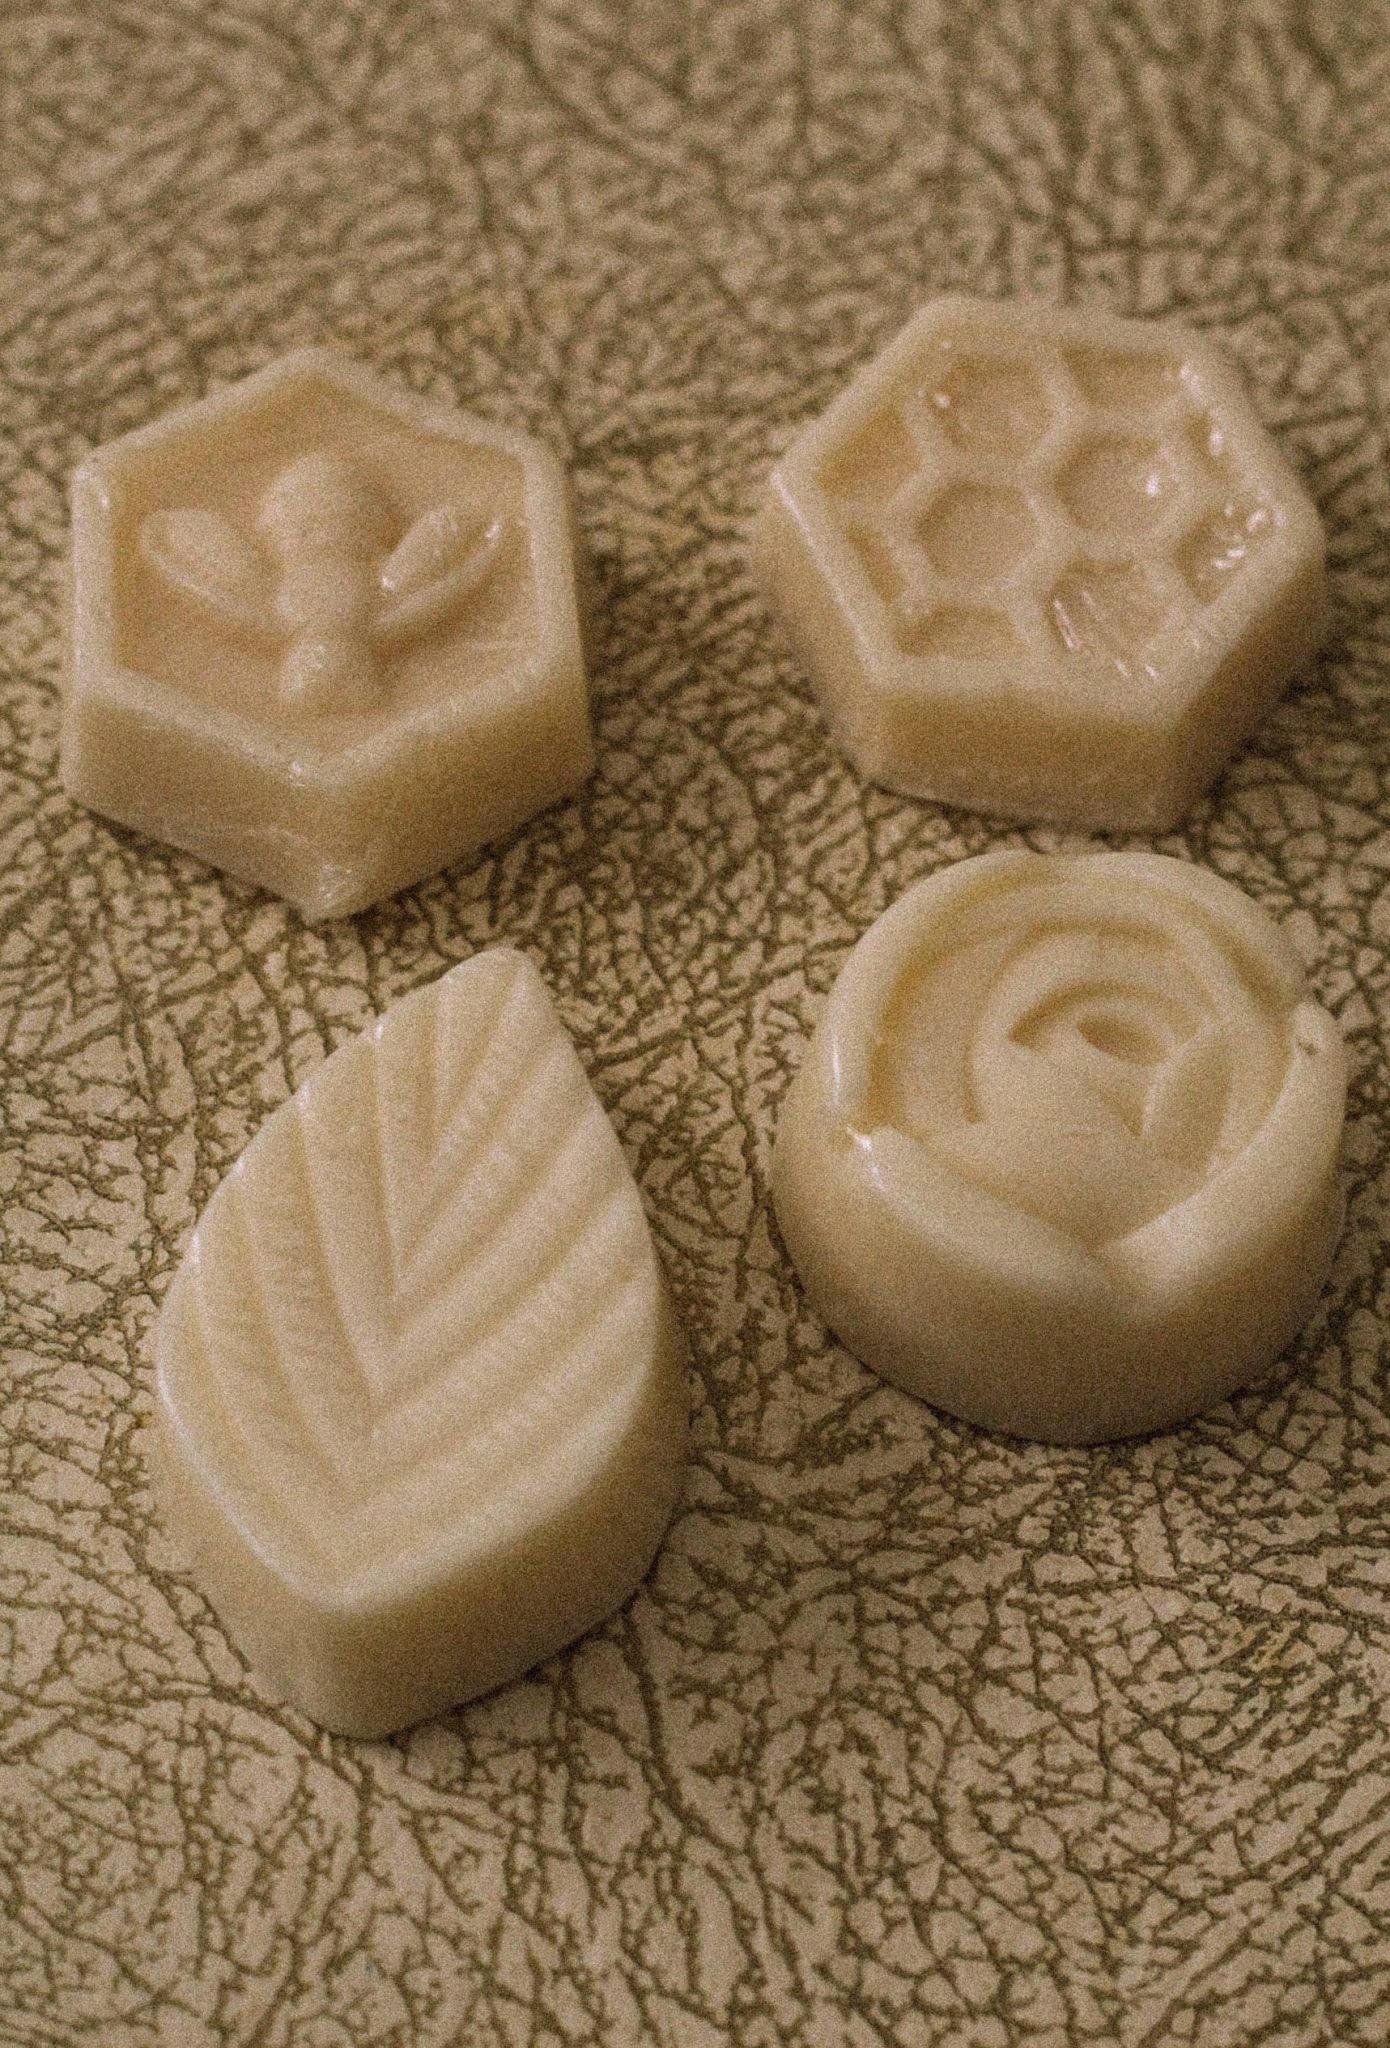 Image of homemade soaps for blog on mental health stigma